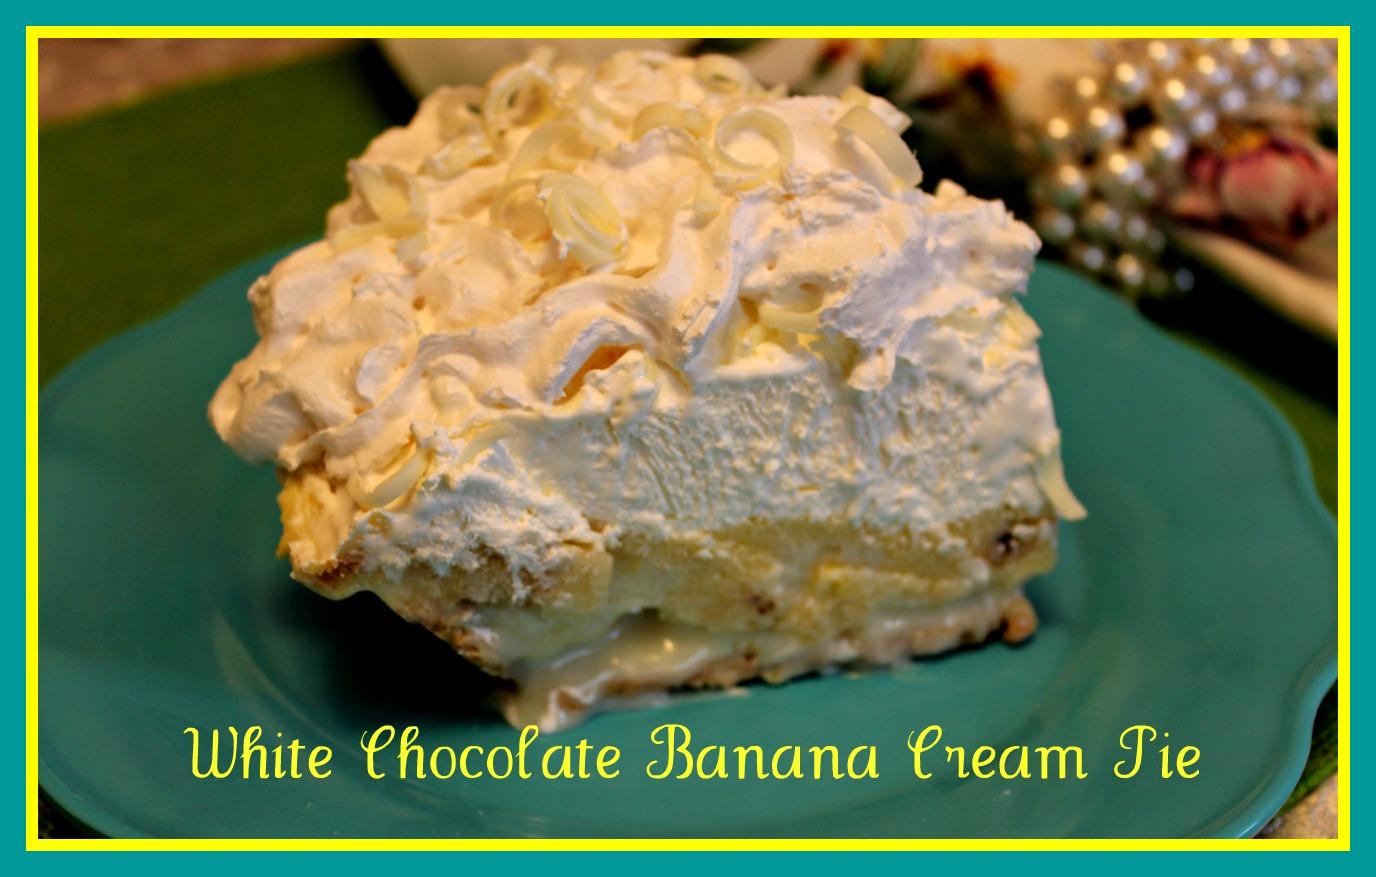 Sweet Tea and Cornbread: White Chocolate Banana Cream Pie!